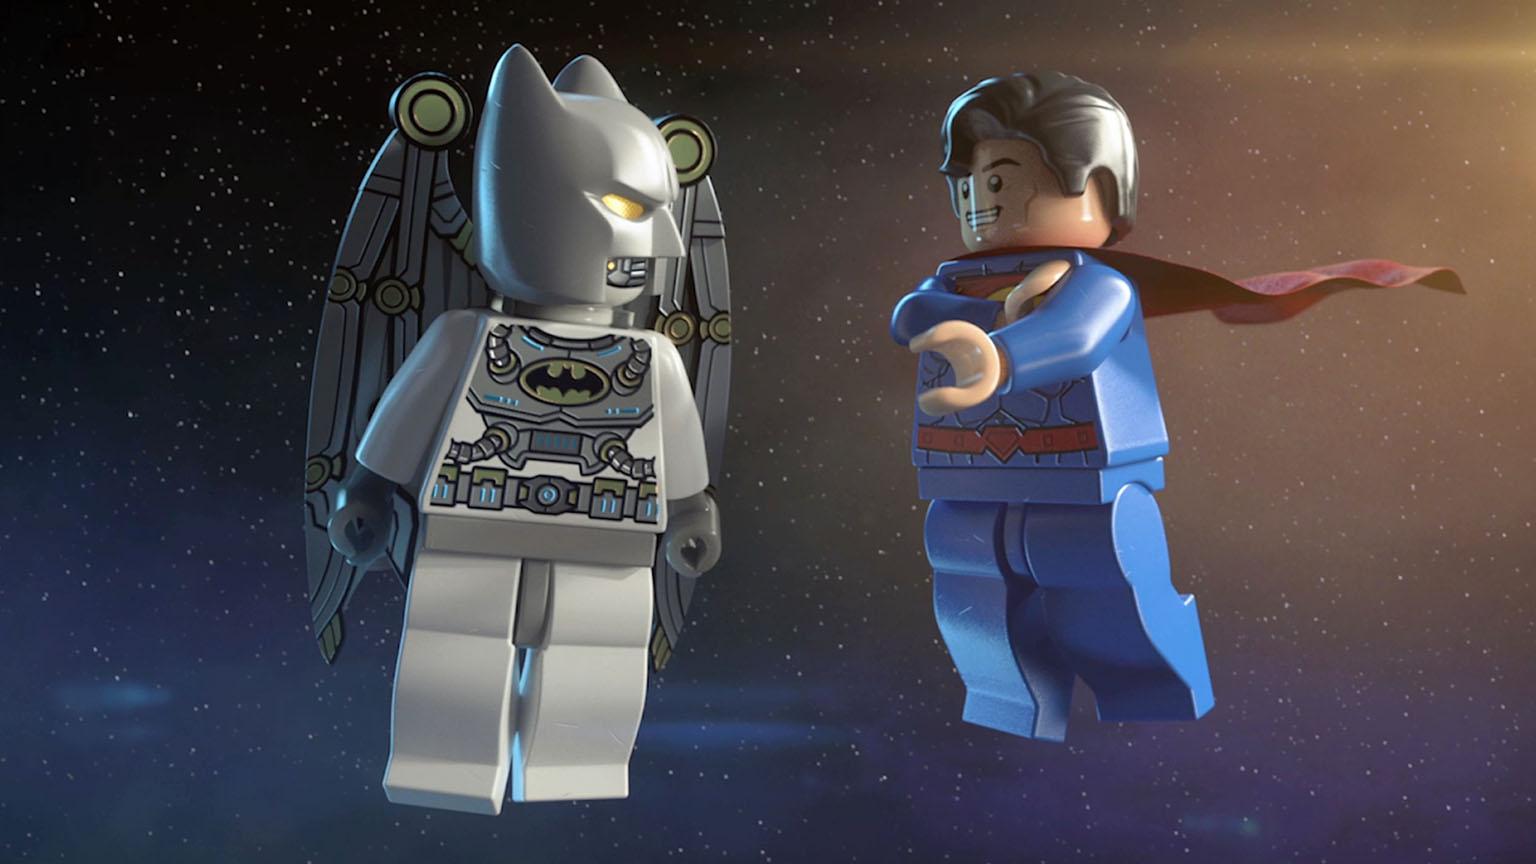 LegoBatman_02